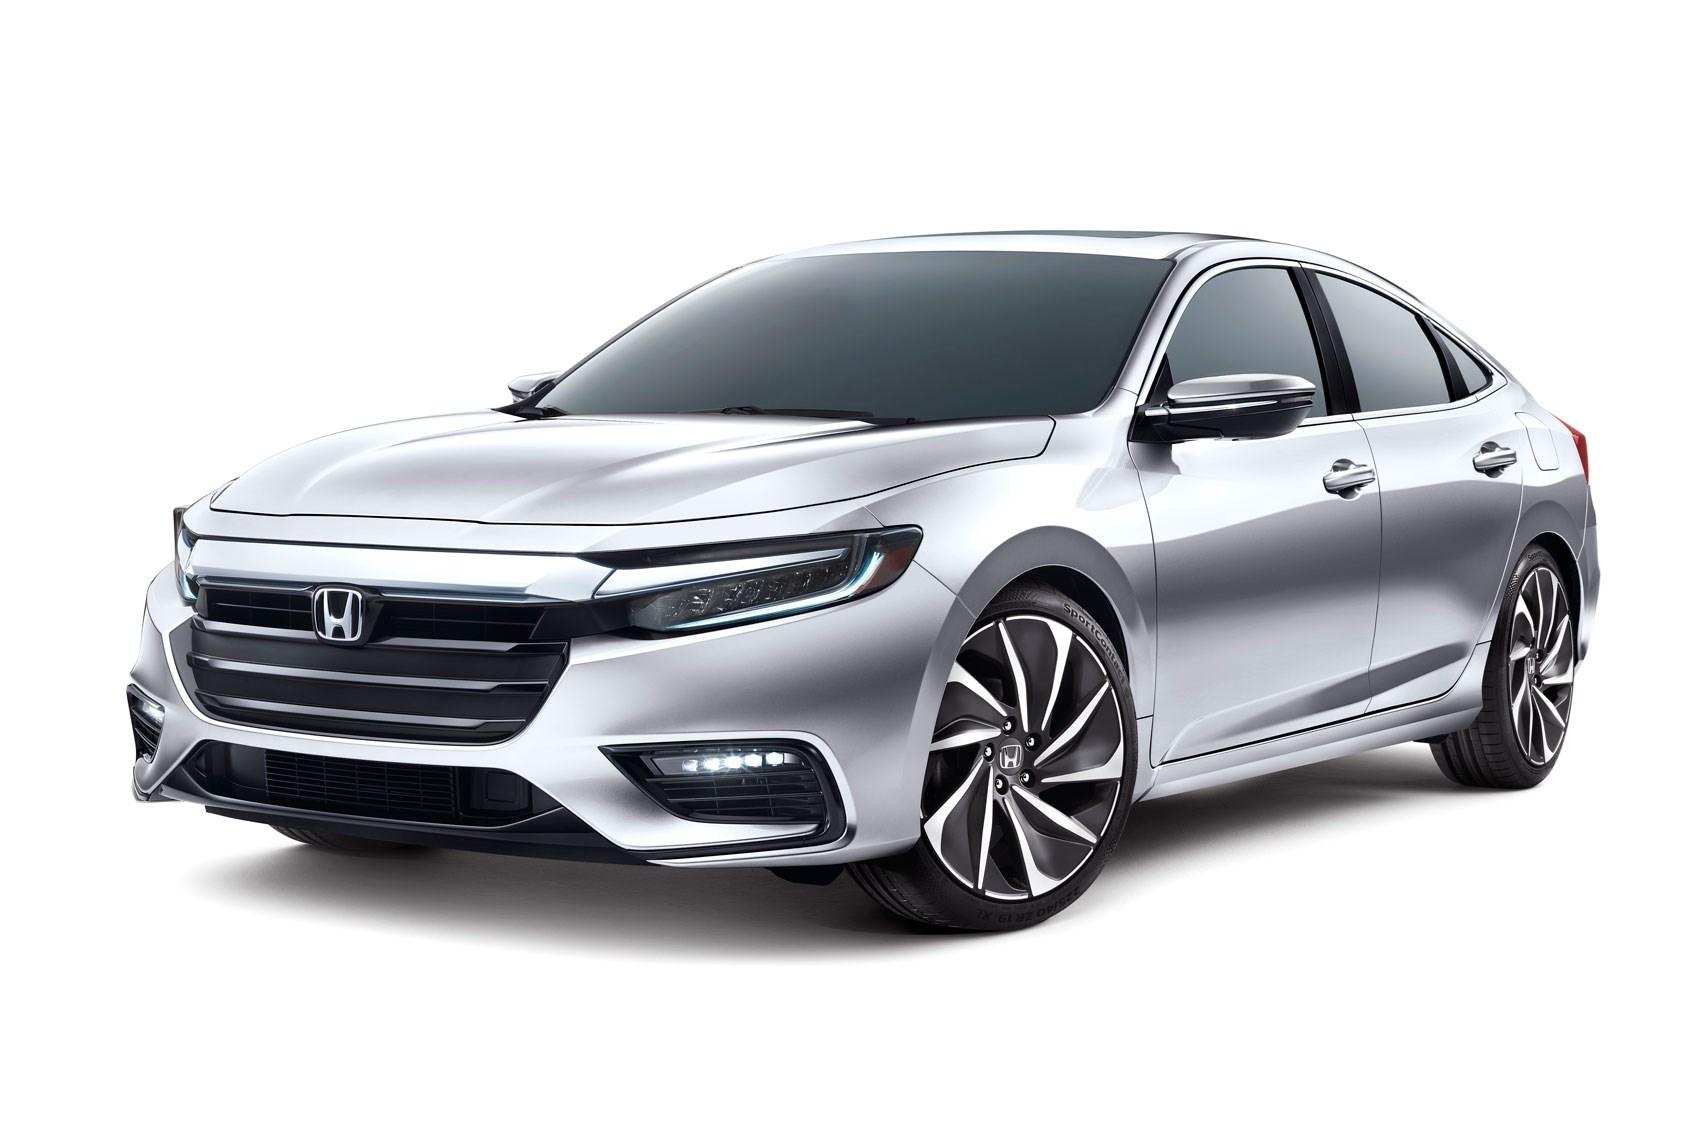 New Honda Insight Sleek Hybrid Prototype S Specs Detailed